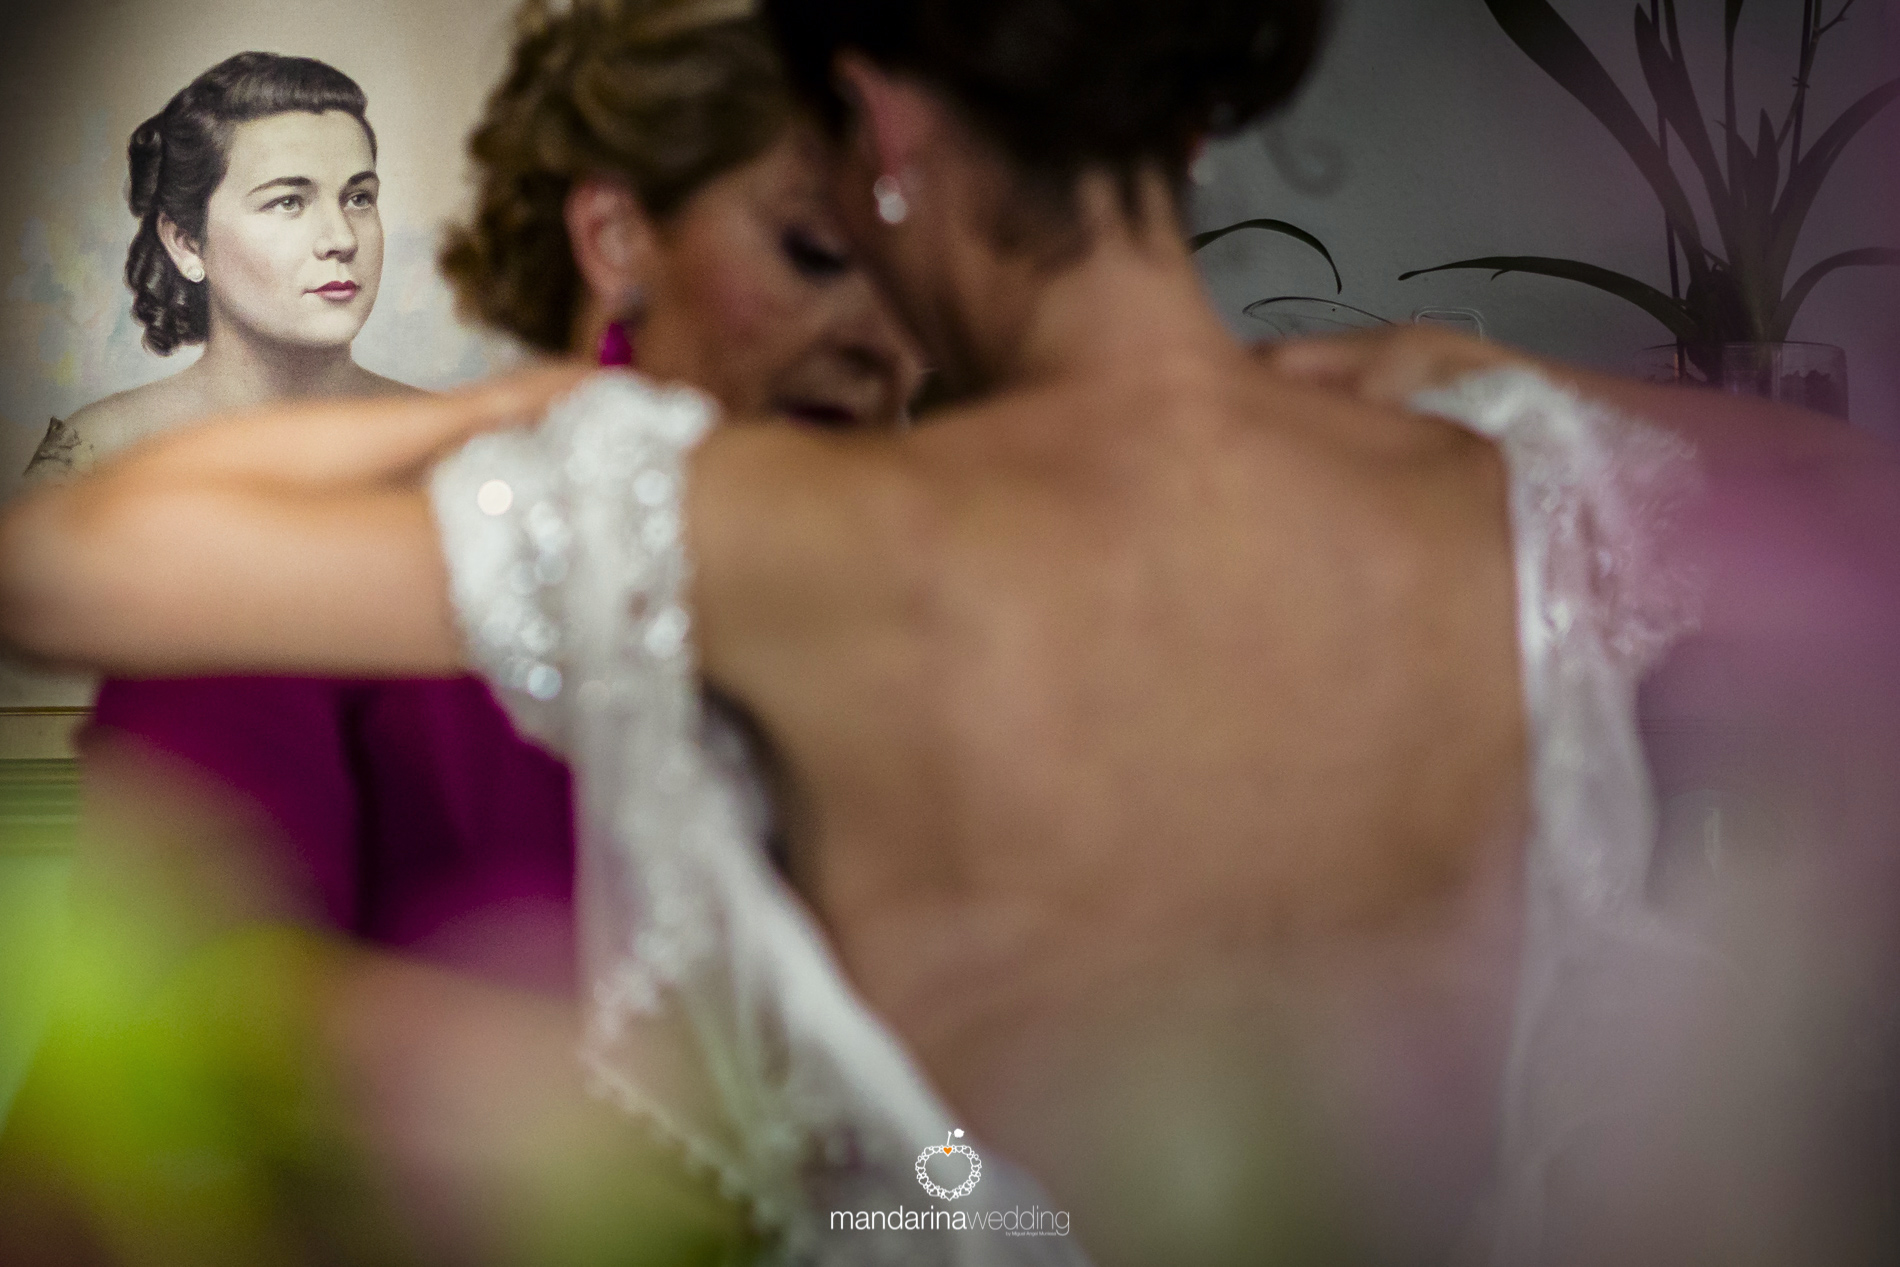 mandaria wedding, fotografos de boda, fotoperiodismo de boda, mejores fotografos de boda, bodas soria, bodas pirineo, bodas Madrid, fotógrafos tarragona_13